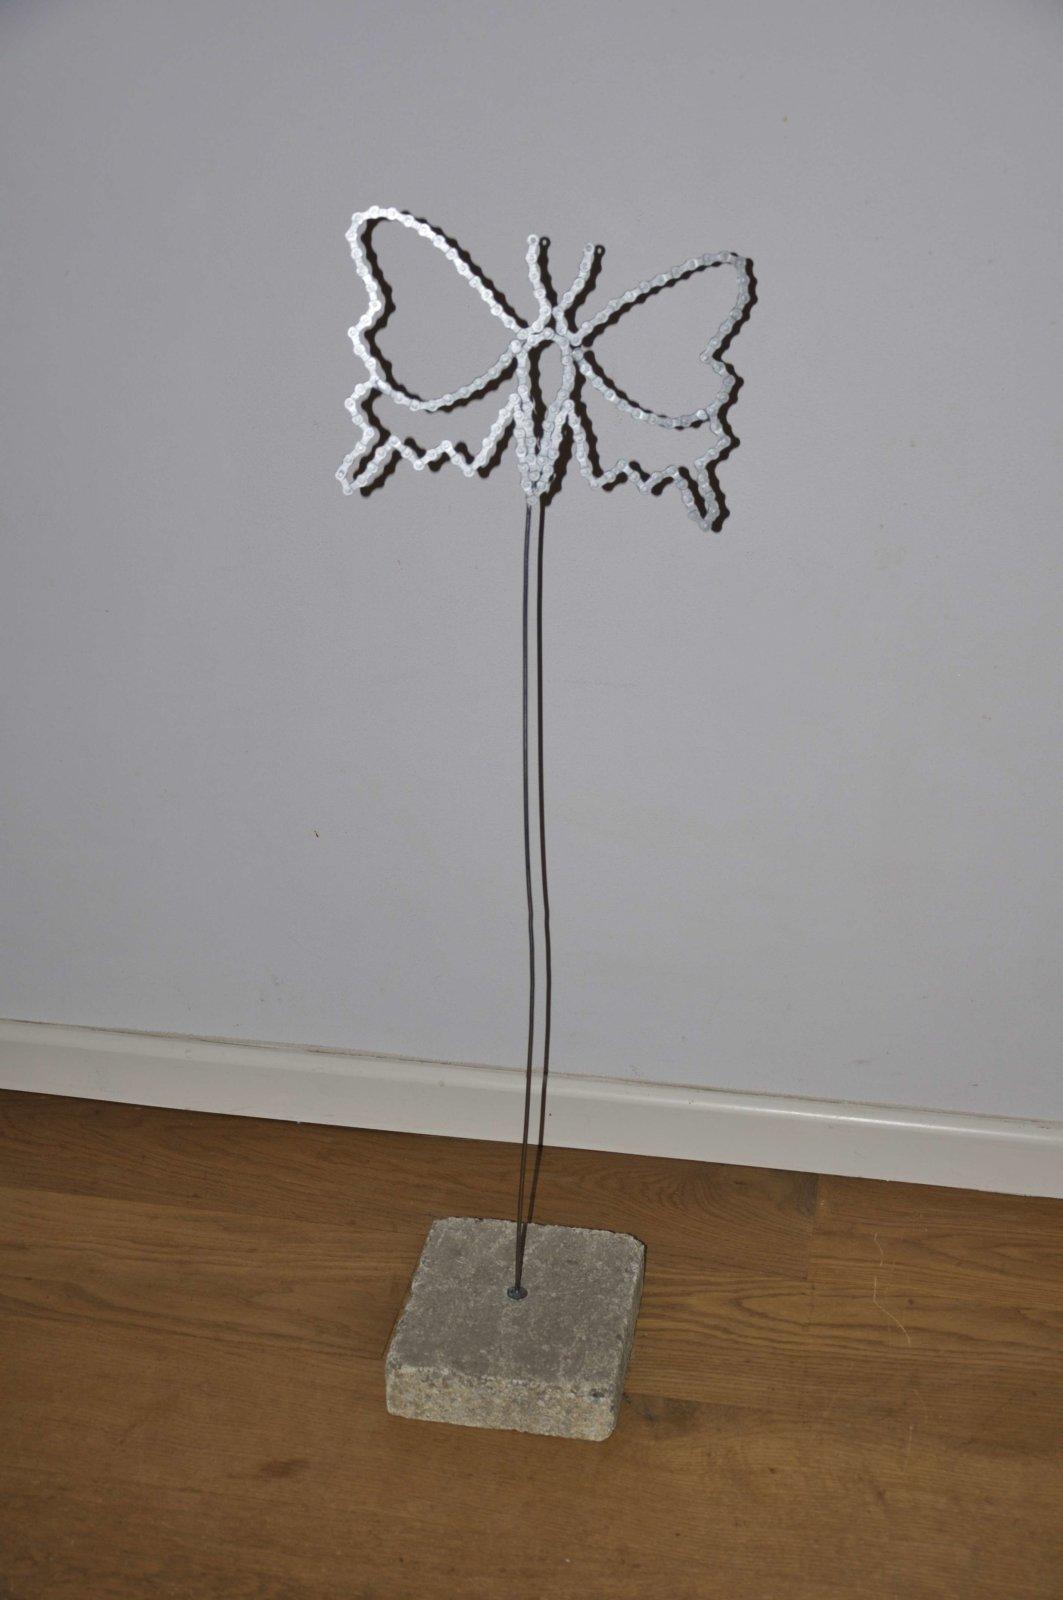 Vlinder Made By Decreatievelink Upcycle Your Life Art & Design